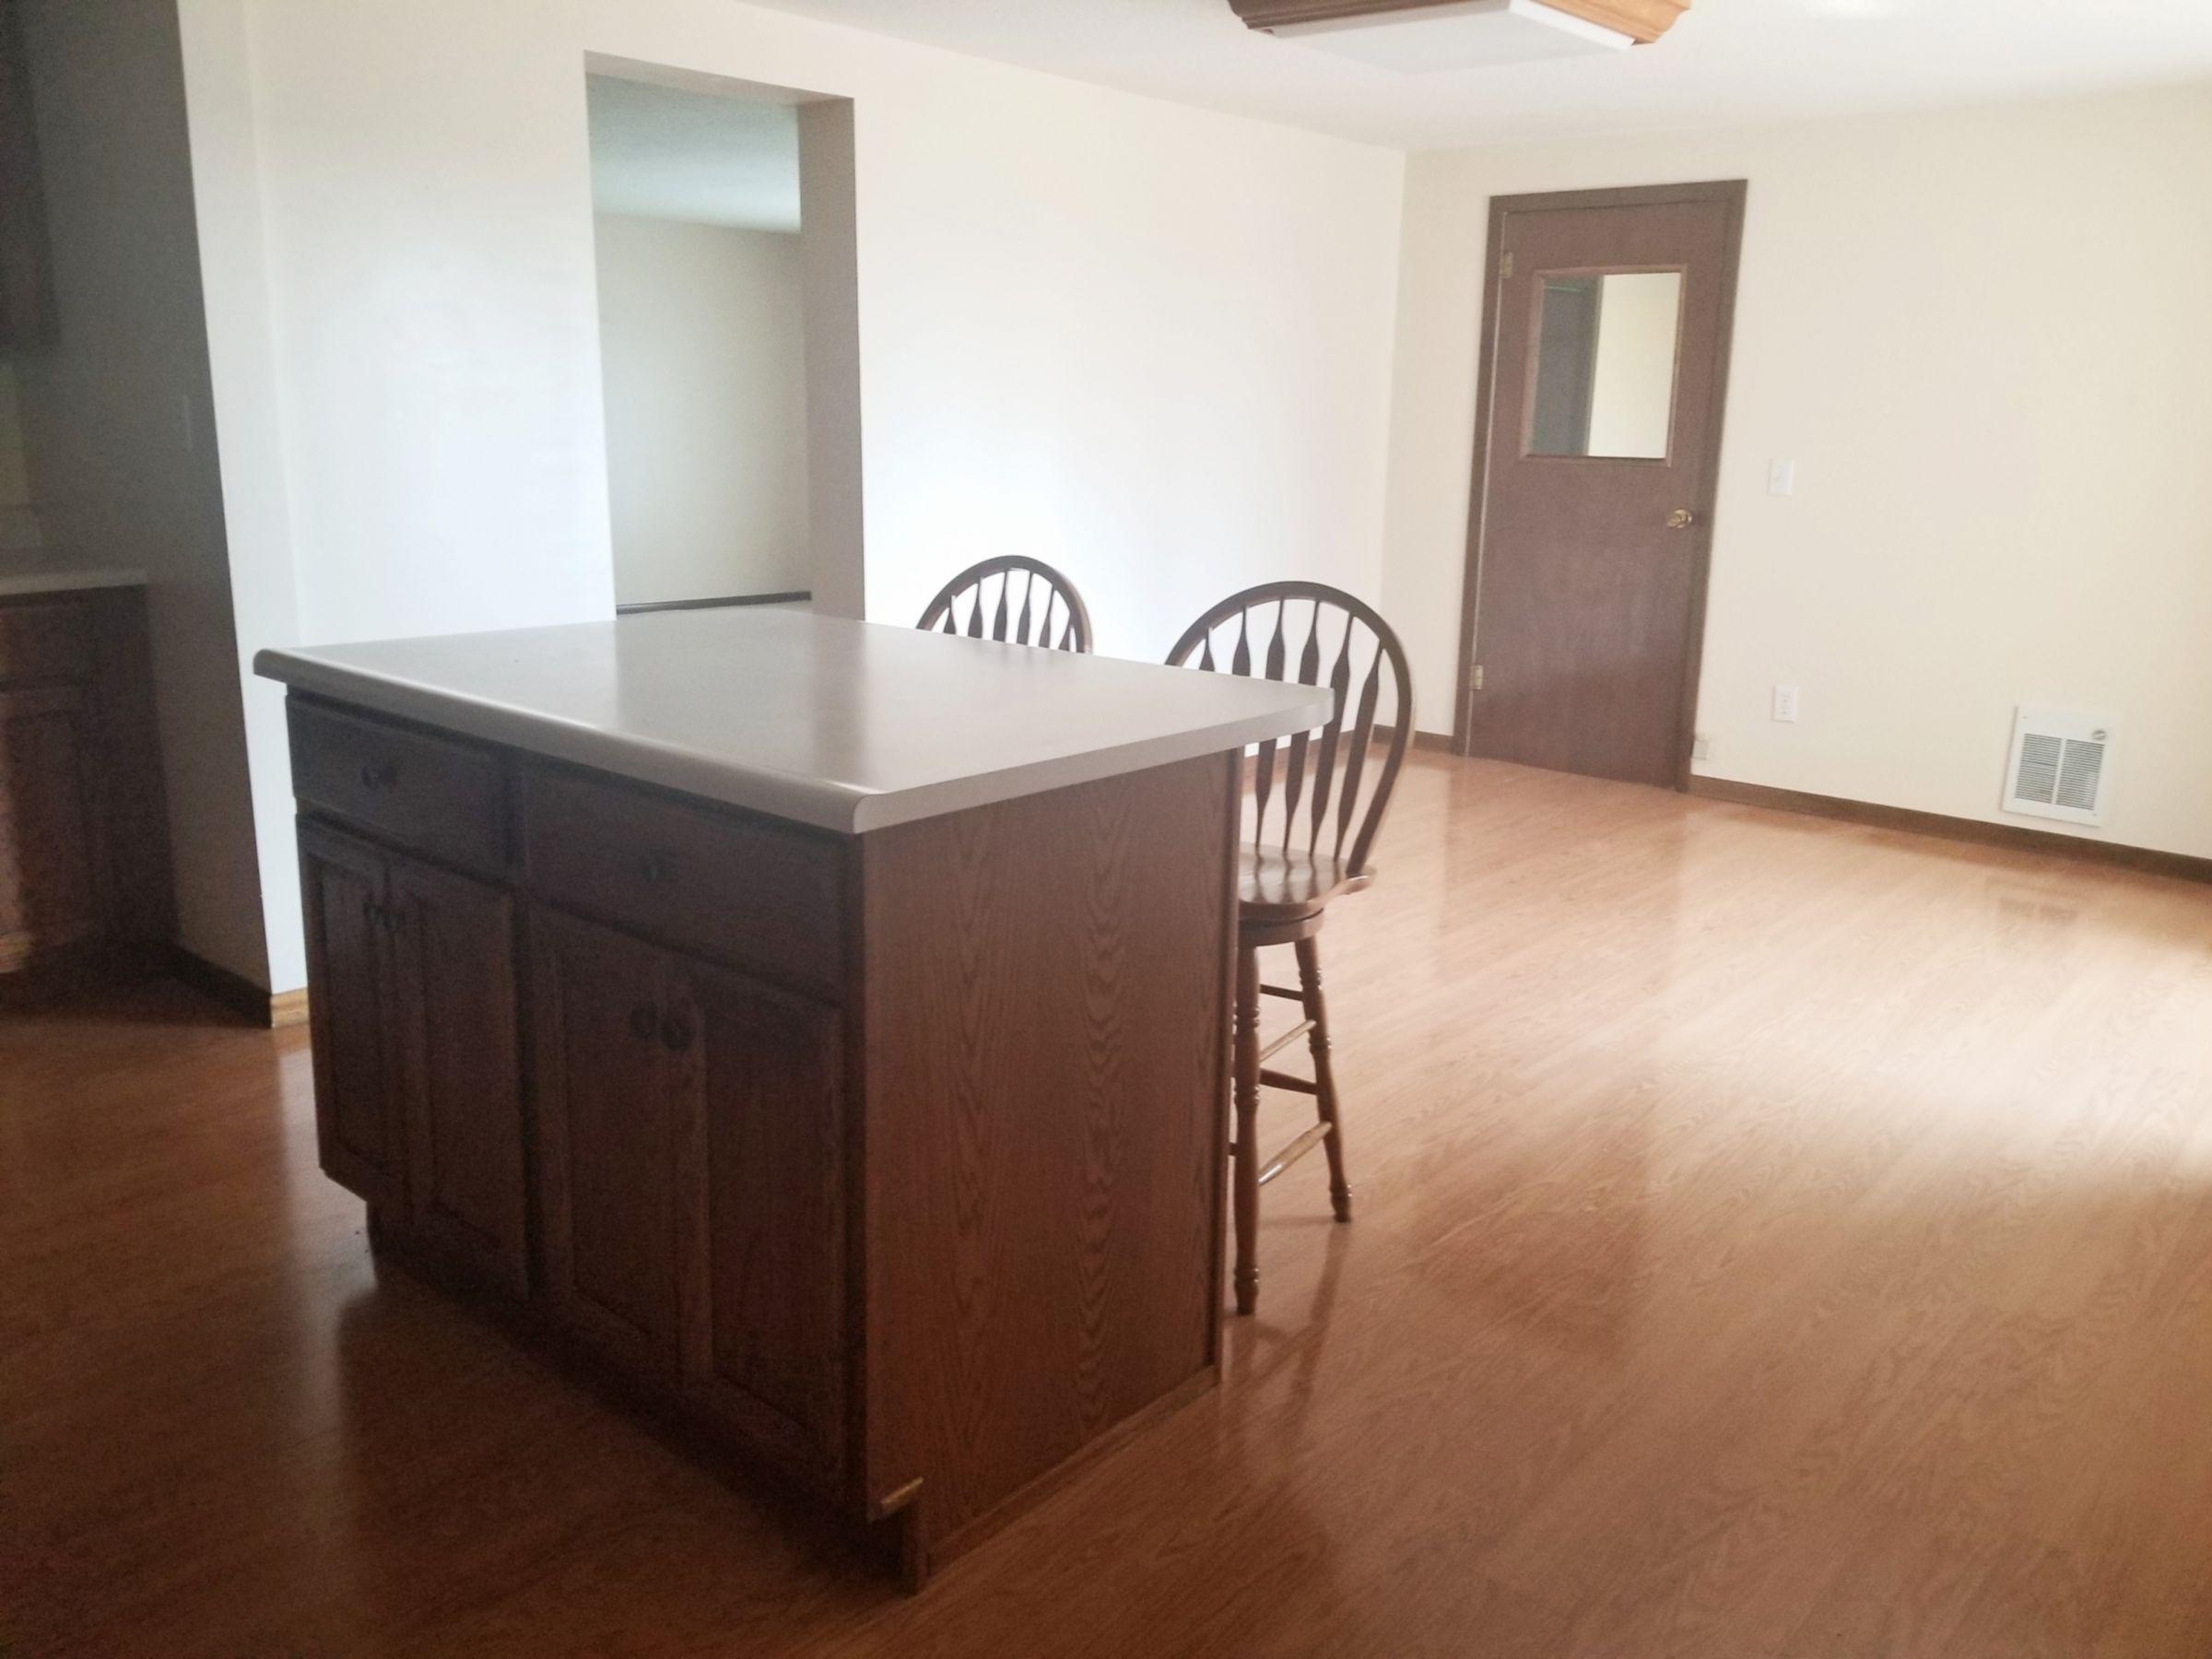 residential-land-poweshiek-county-iowa-5-acres-listing-number-15149-5-2020-08-28-200843.jpg